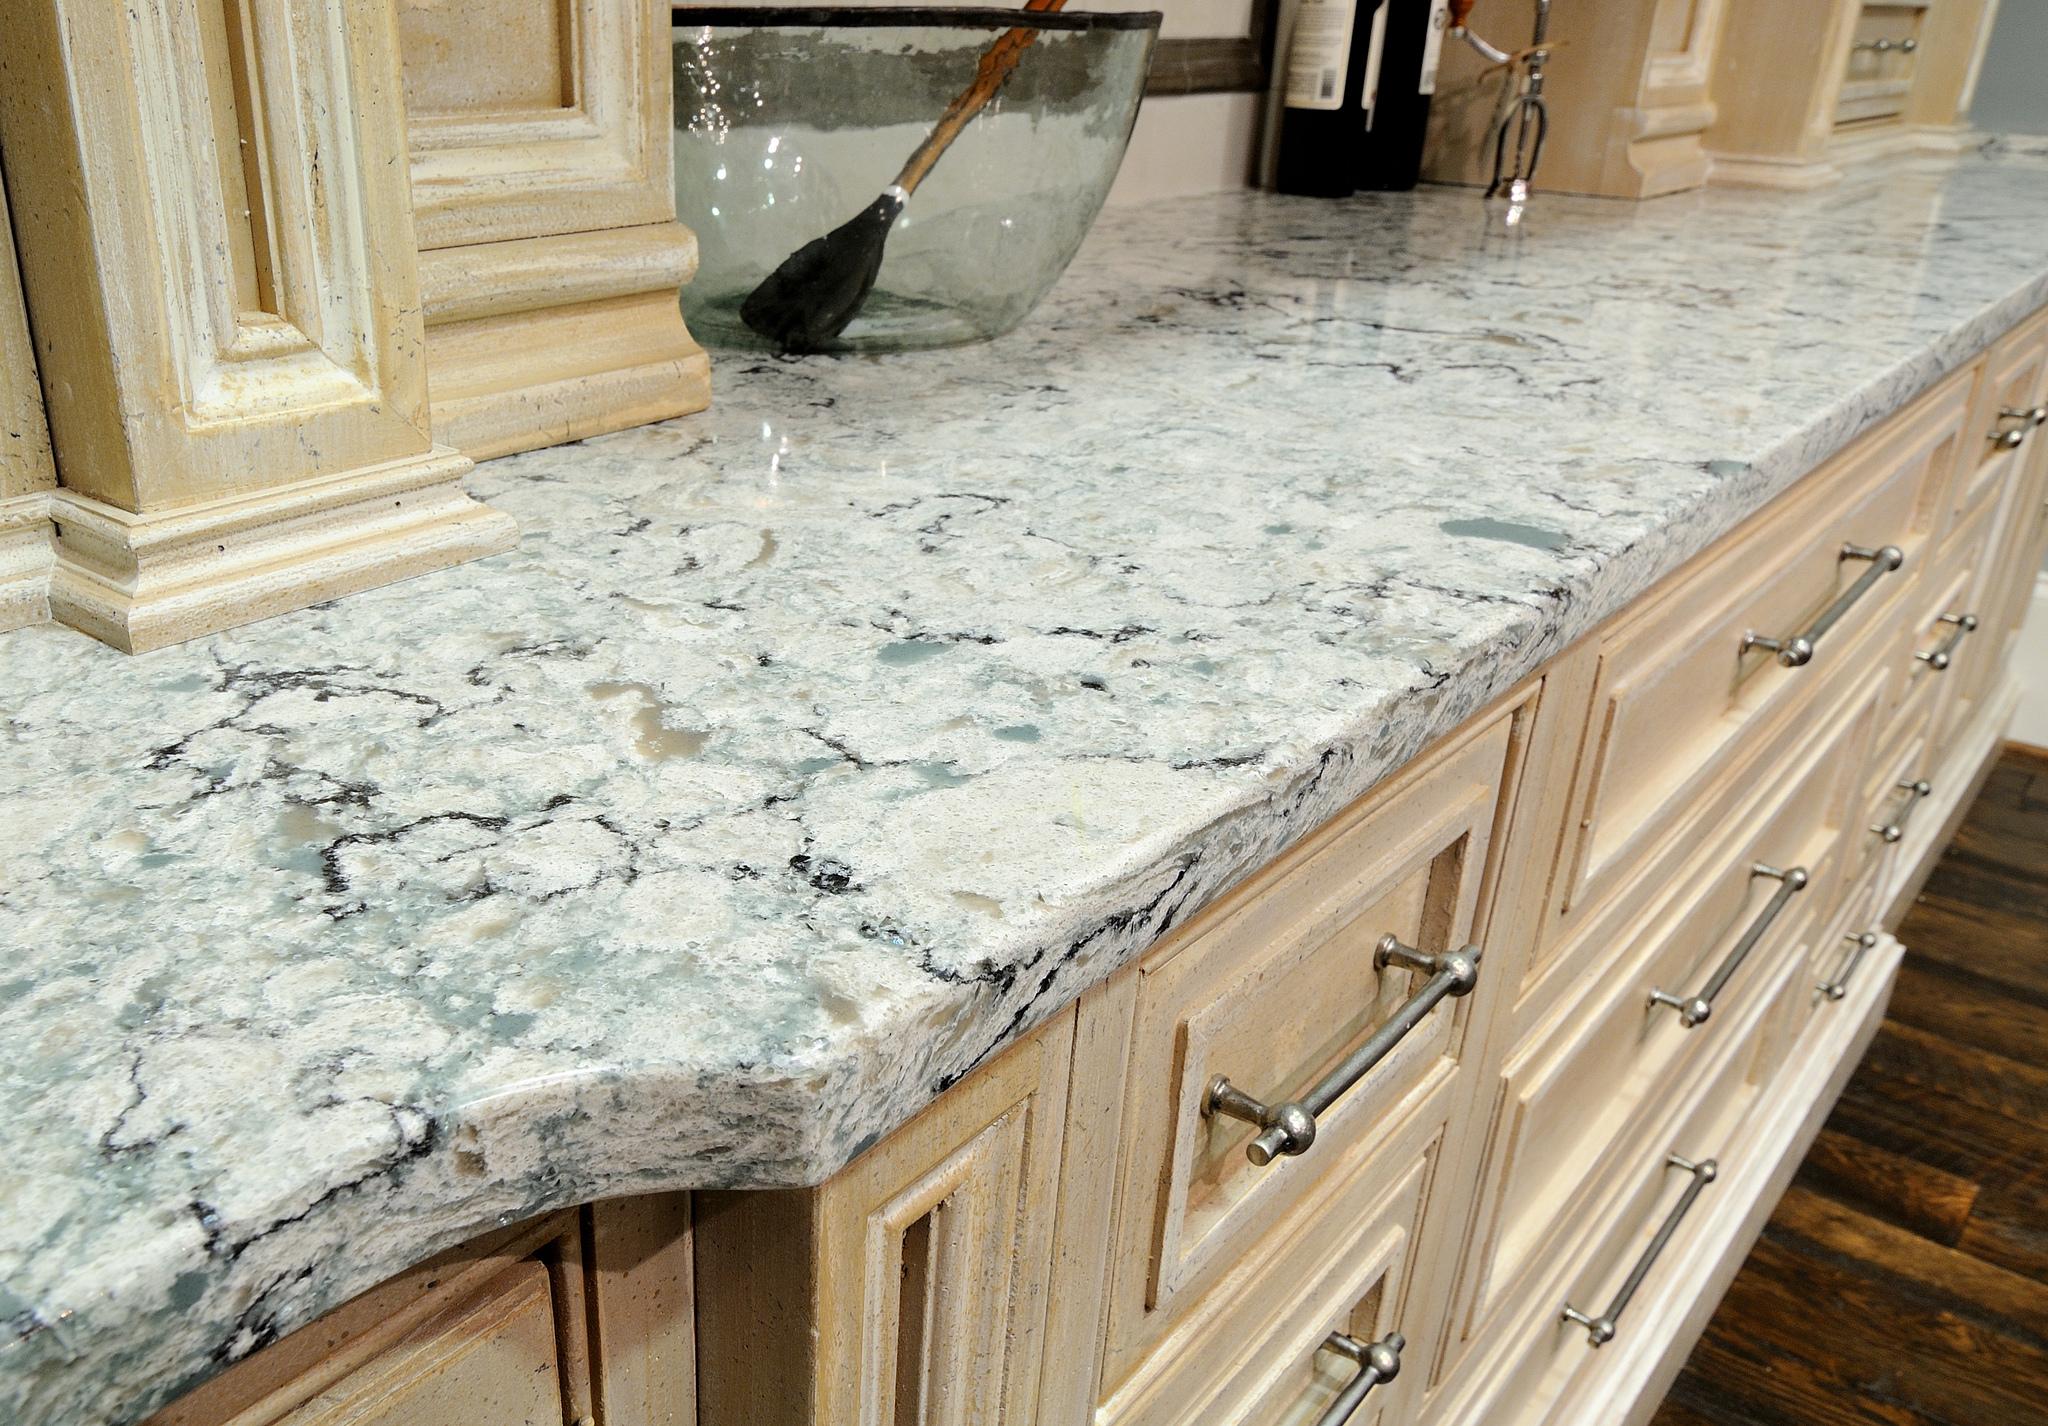 getting over granite 6 kitchen countertop options that arent in everyones kitchen kitchen countertops options Quartz